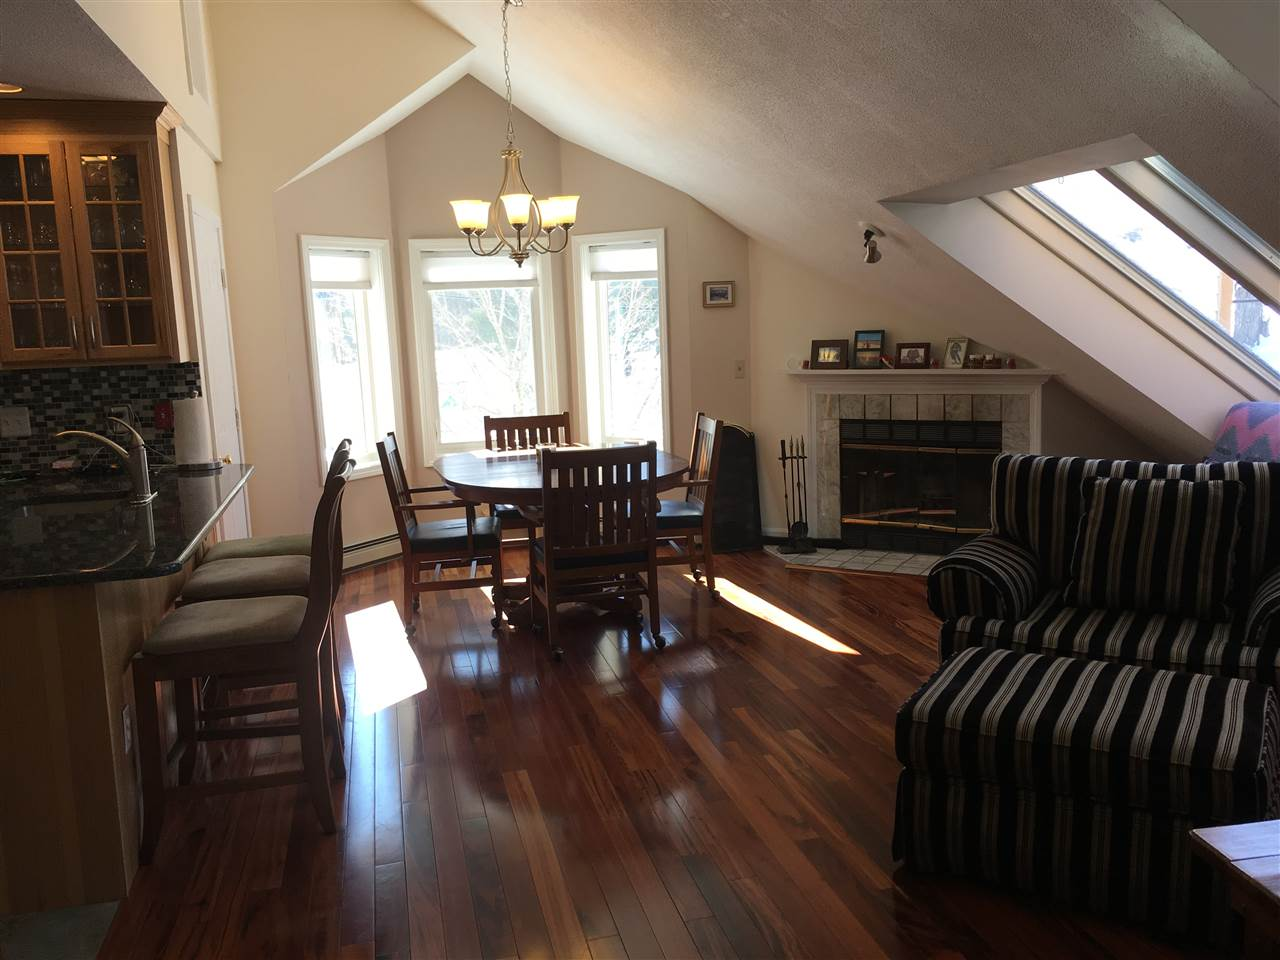 Mount-Snow-Real-Estate-4617963-7